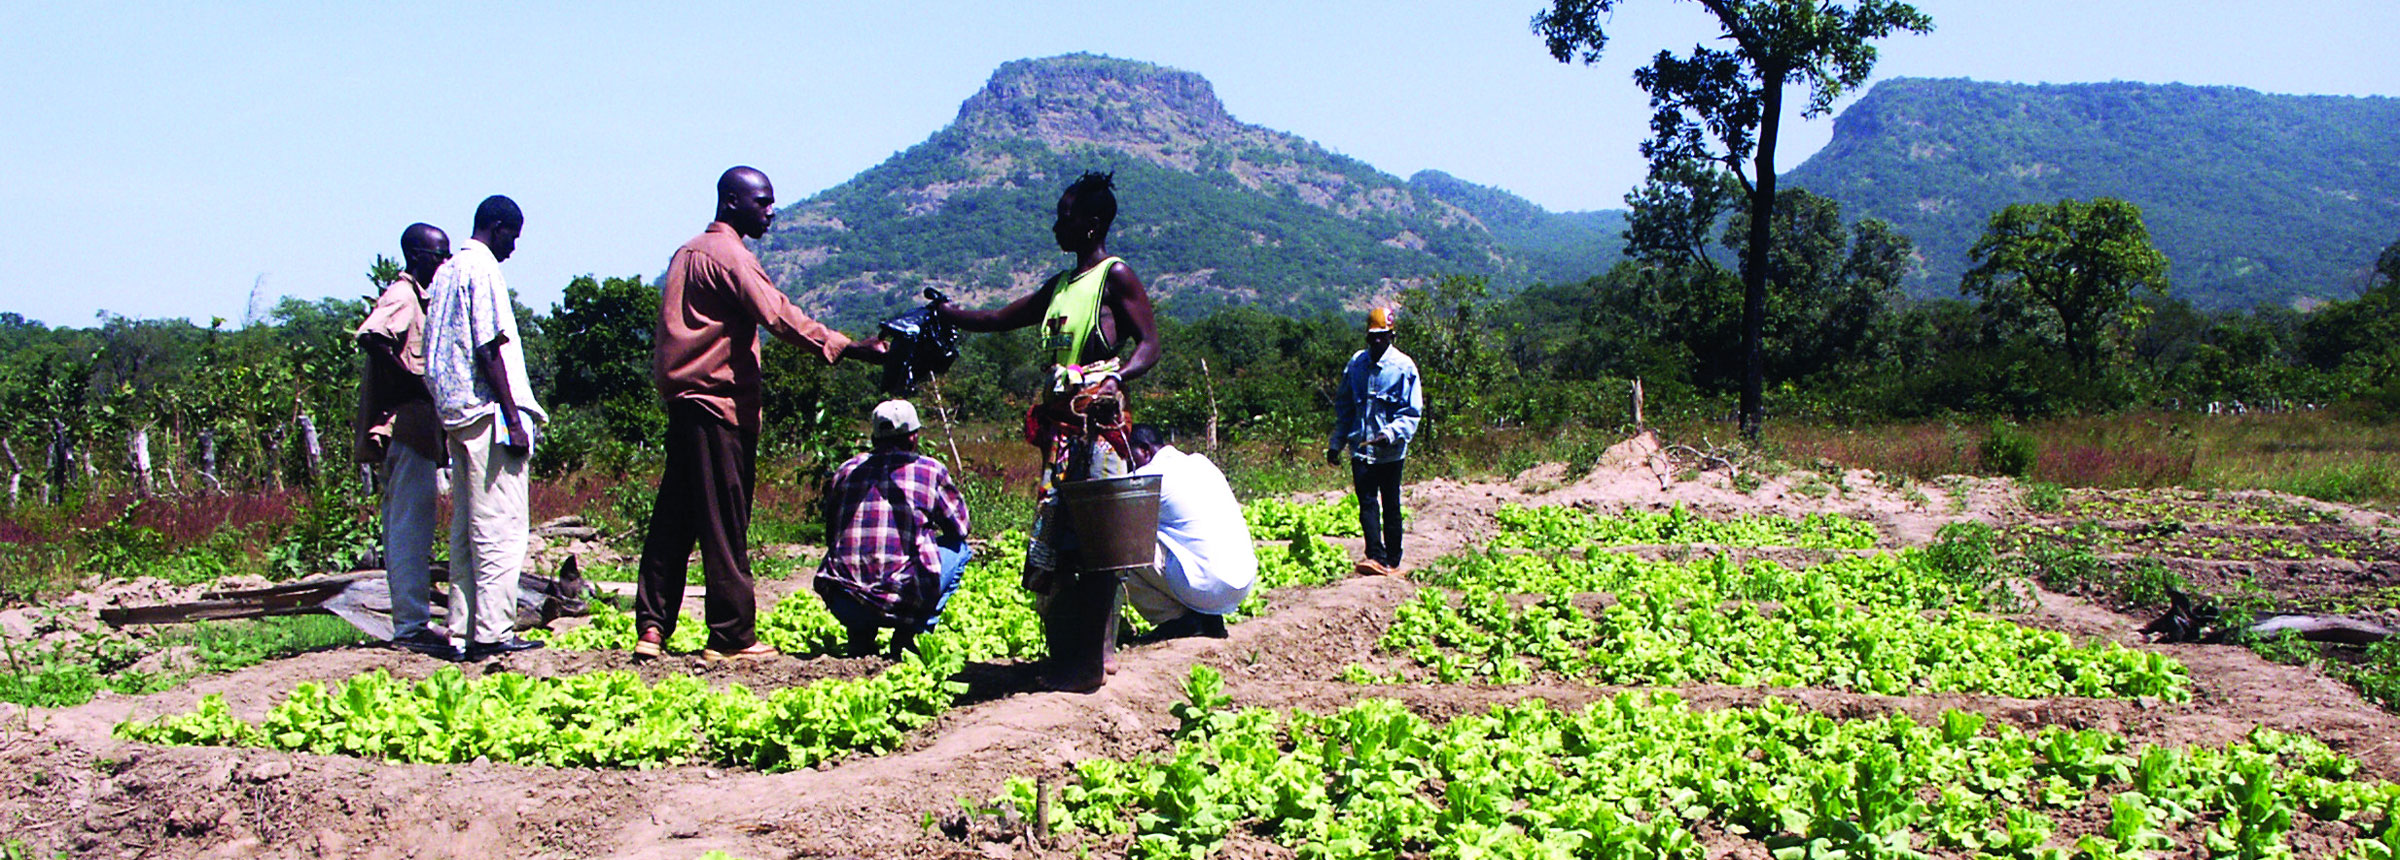 Guinea farmers